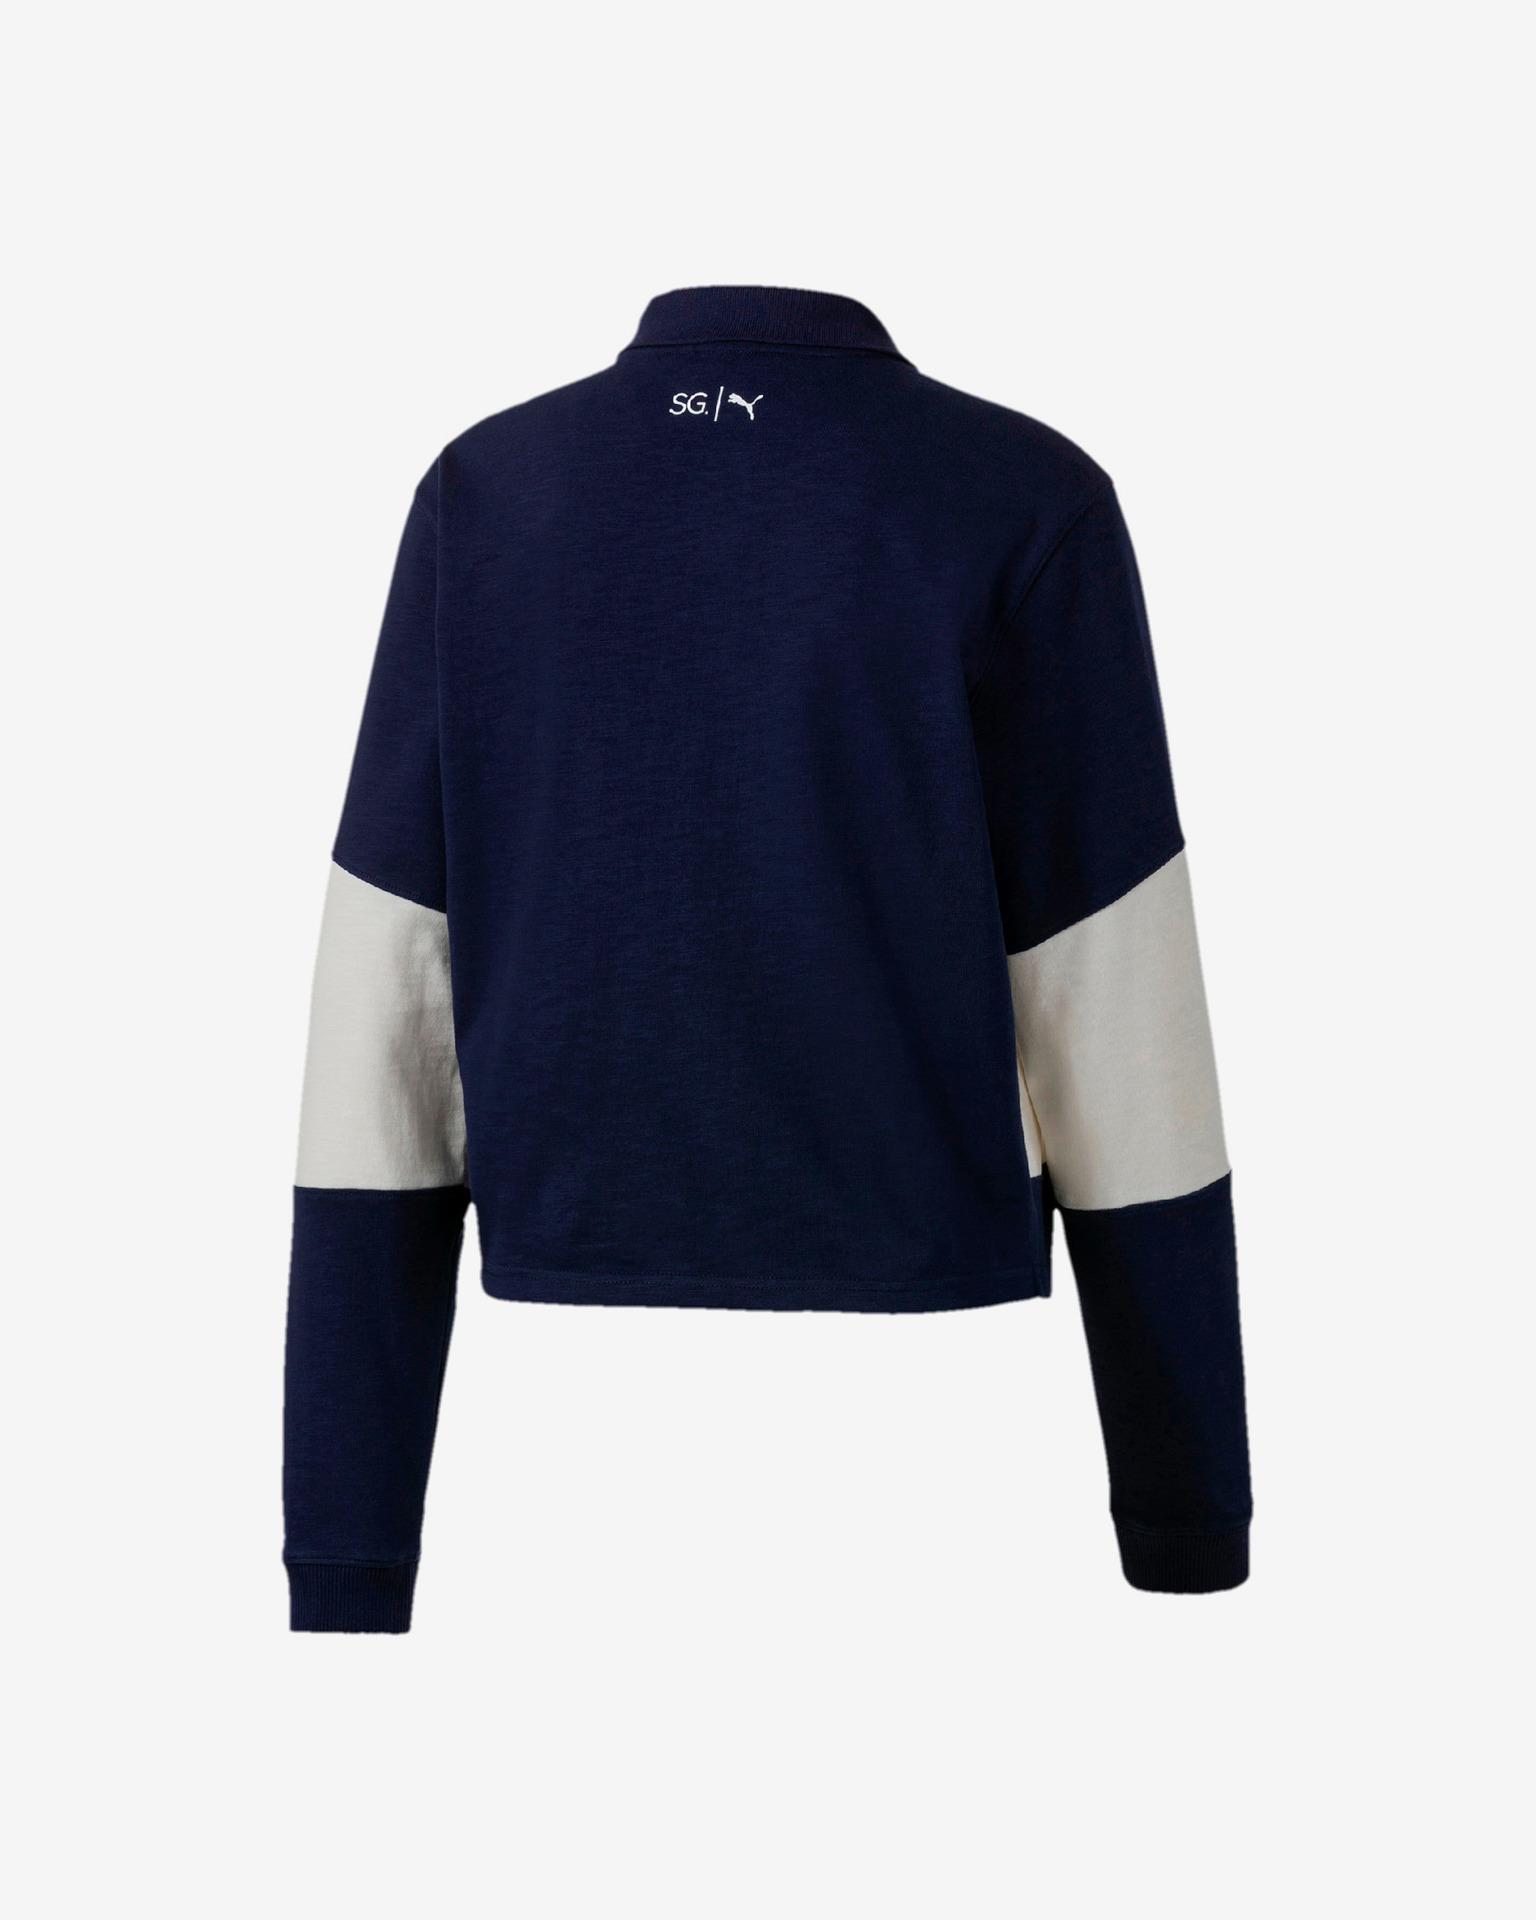 Puma Women's t-shirt blue  Gomez